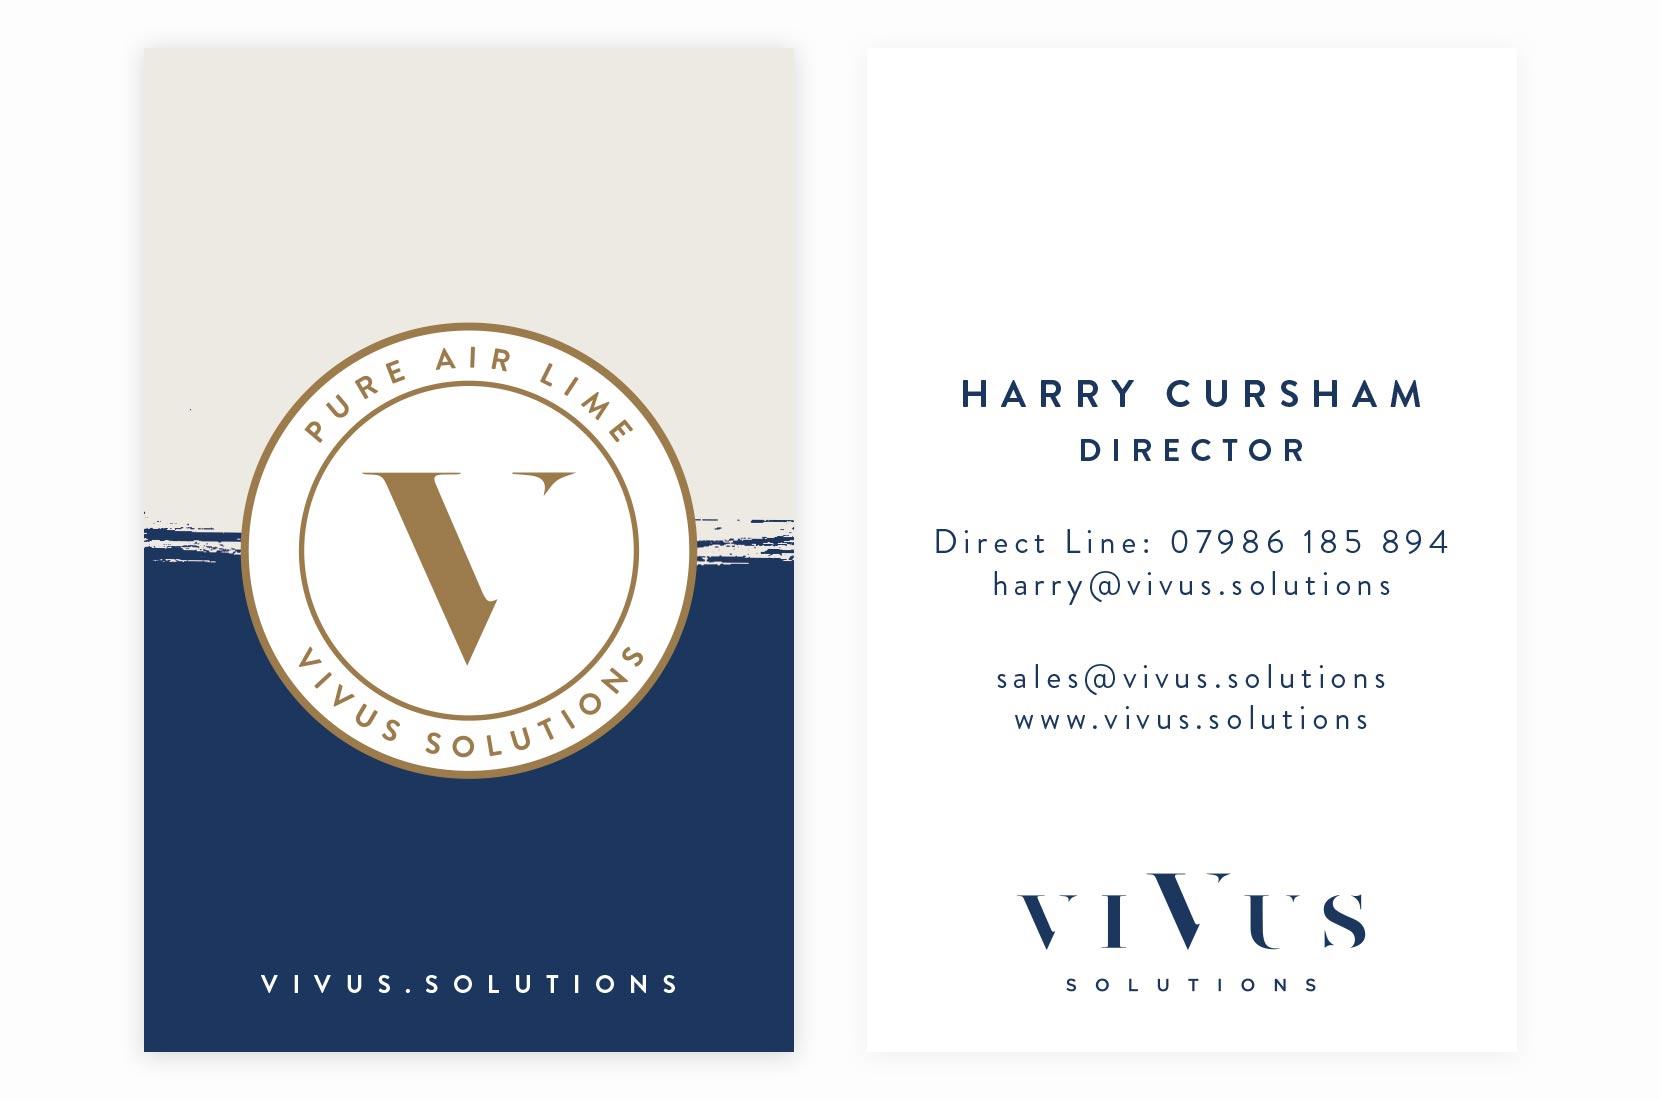 Vivus Solutions Pure Air Lime – Harry Cursham – Director – Business Card design